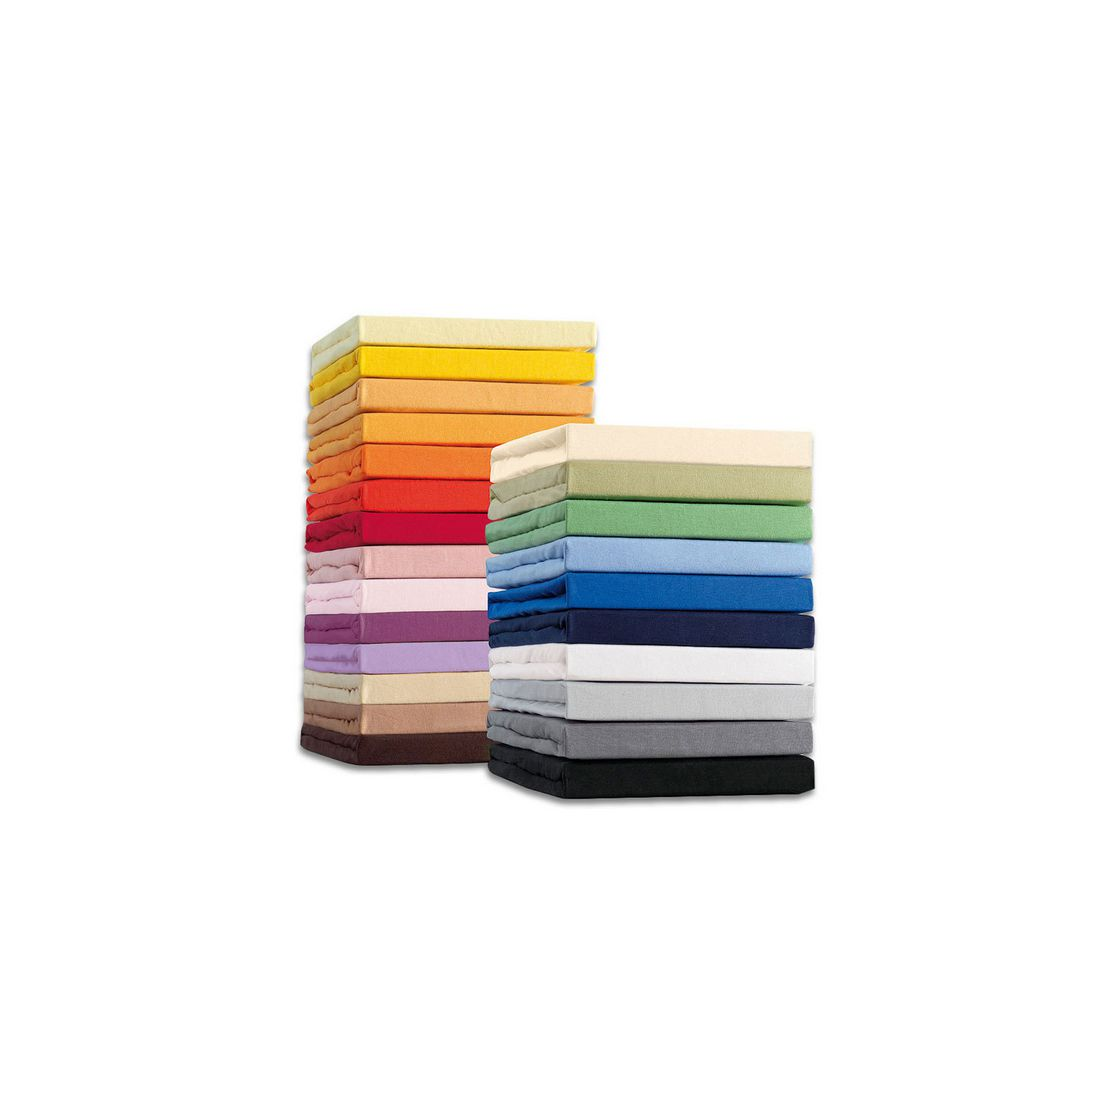 Spannbetttuch – Baumwolle/Elasthan – Aqua – 90×190 – 100×220 cm, Schlafgut günstig kaufen